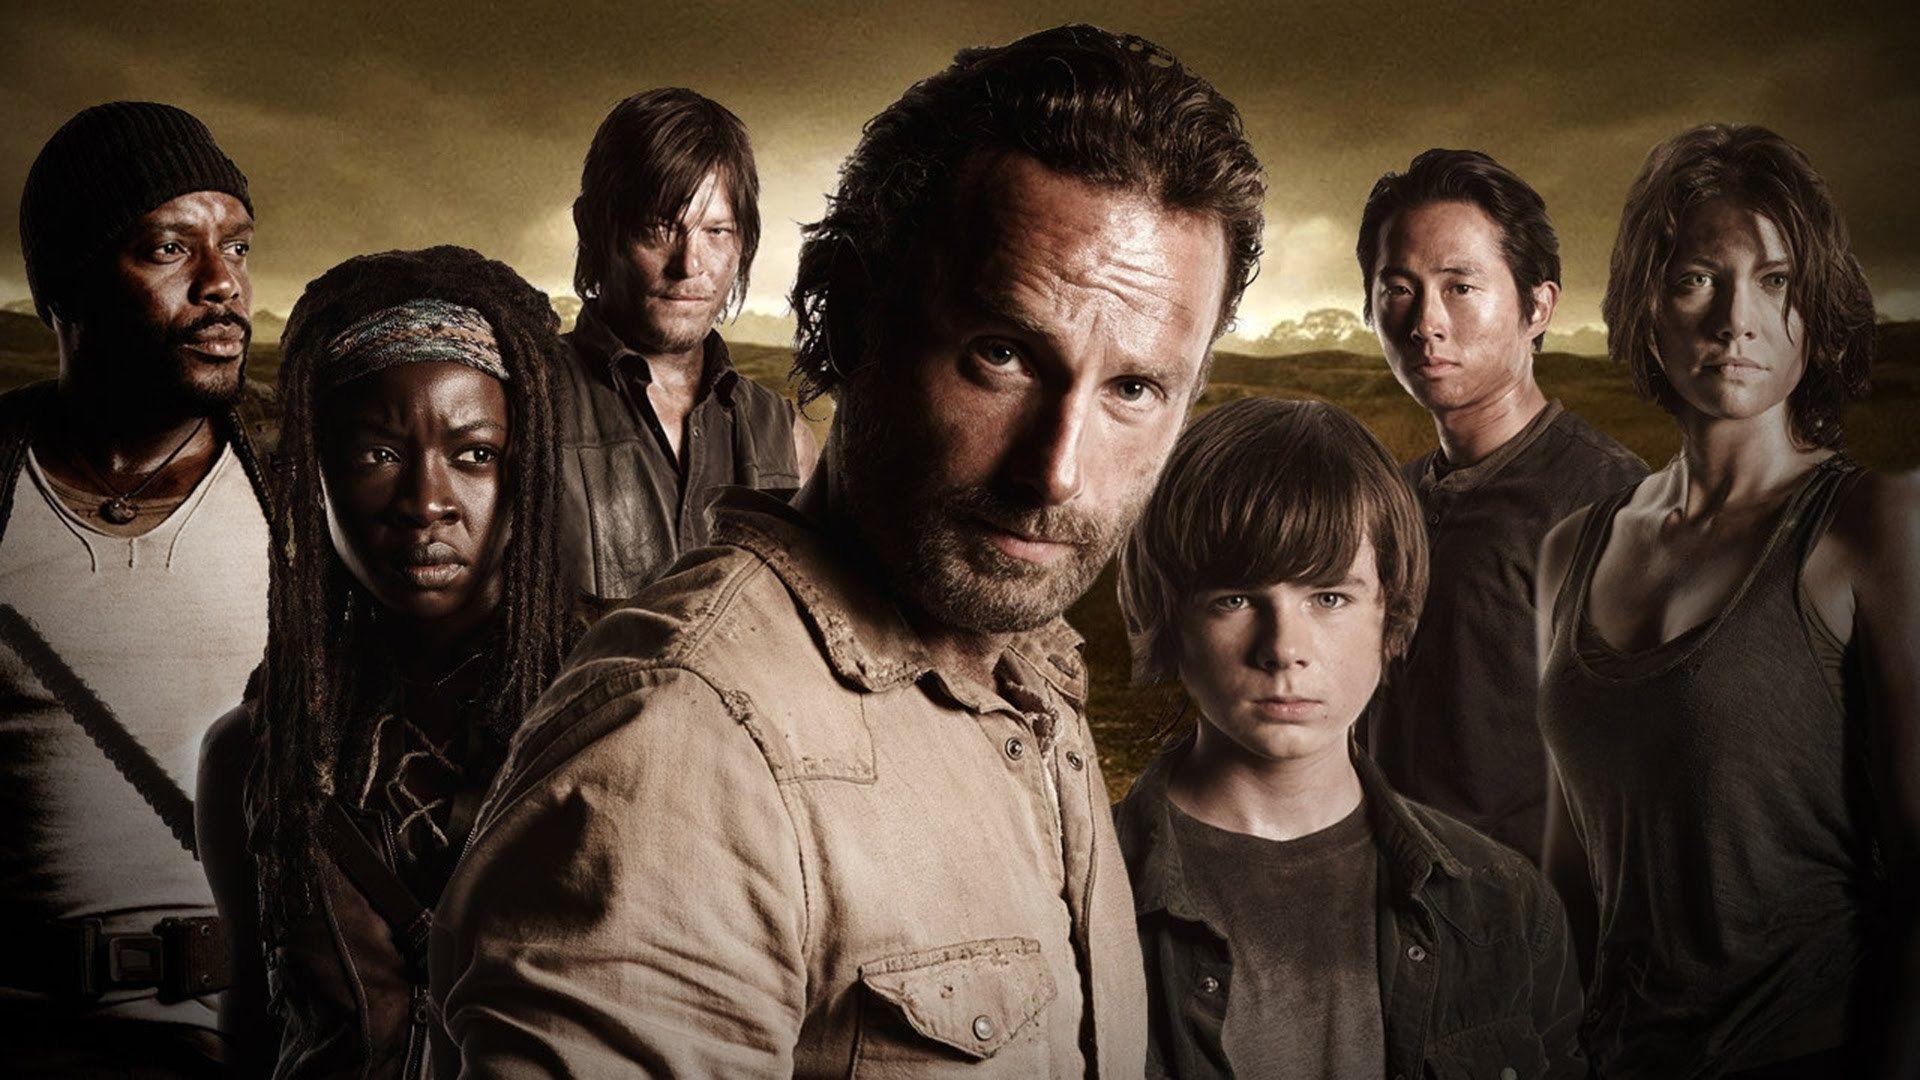 Widescreen Backgrounds The Walking Dead